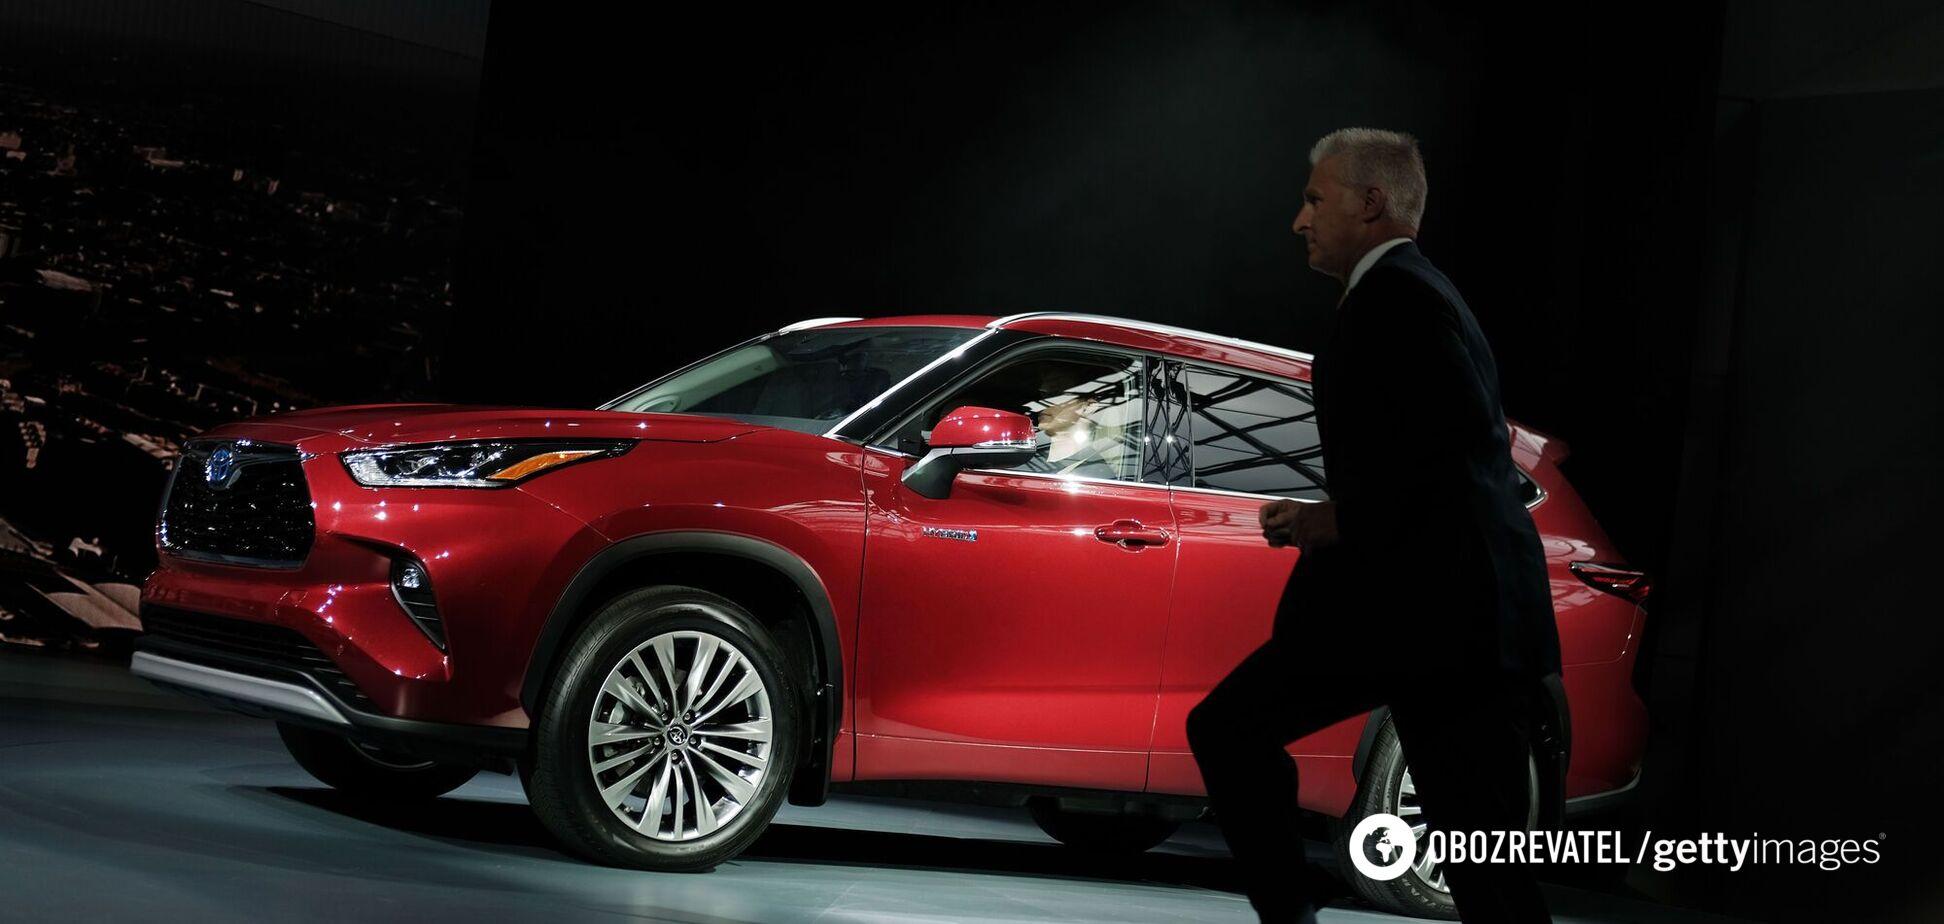 В 'Укроборонпроме' купят Toyota Highlander за 1,6 млн гривен